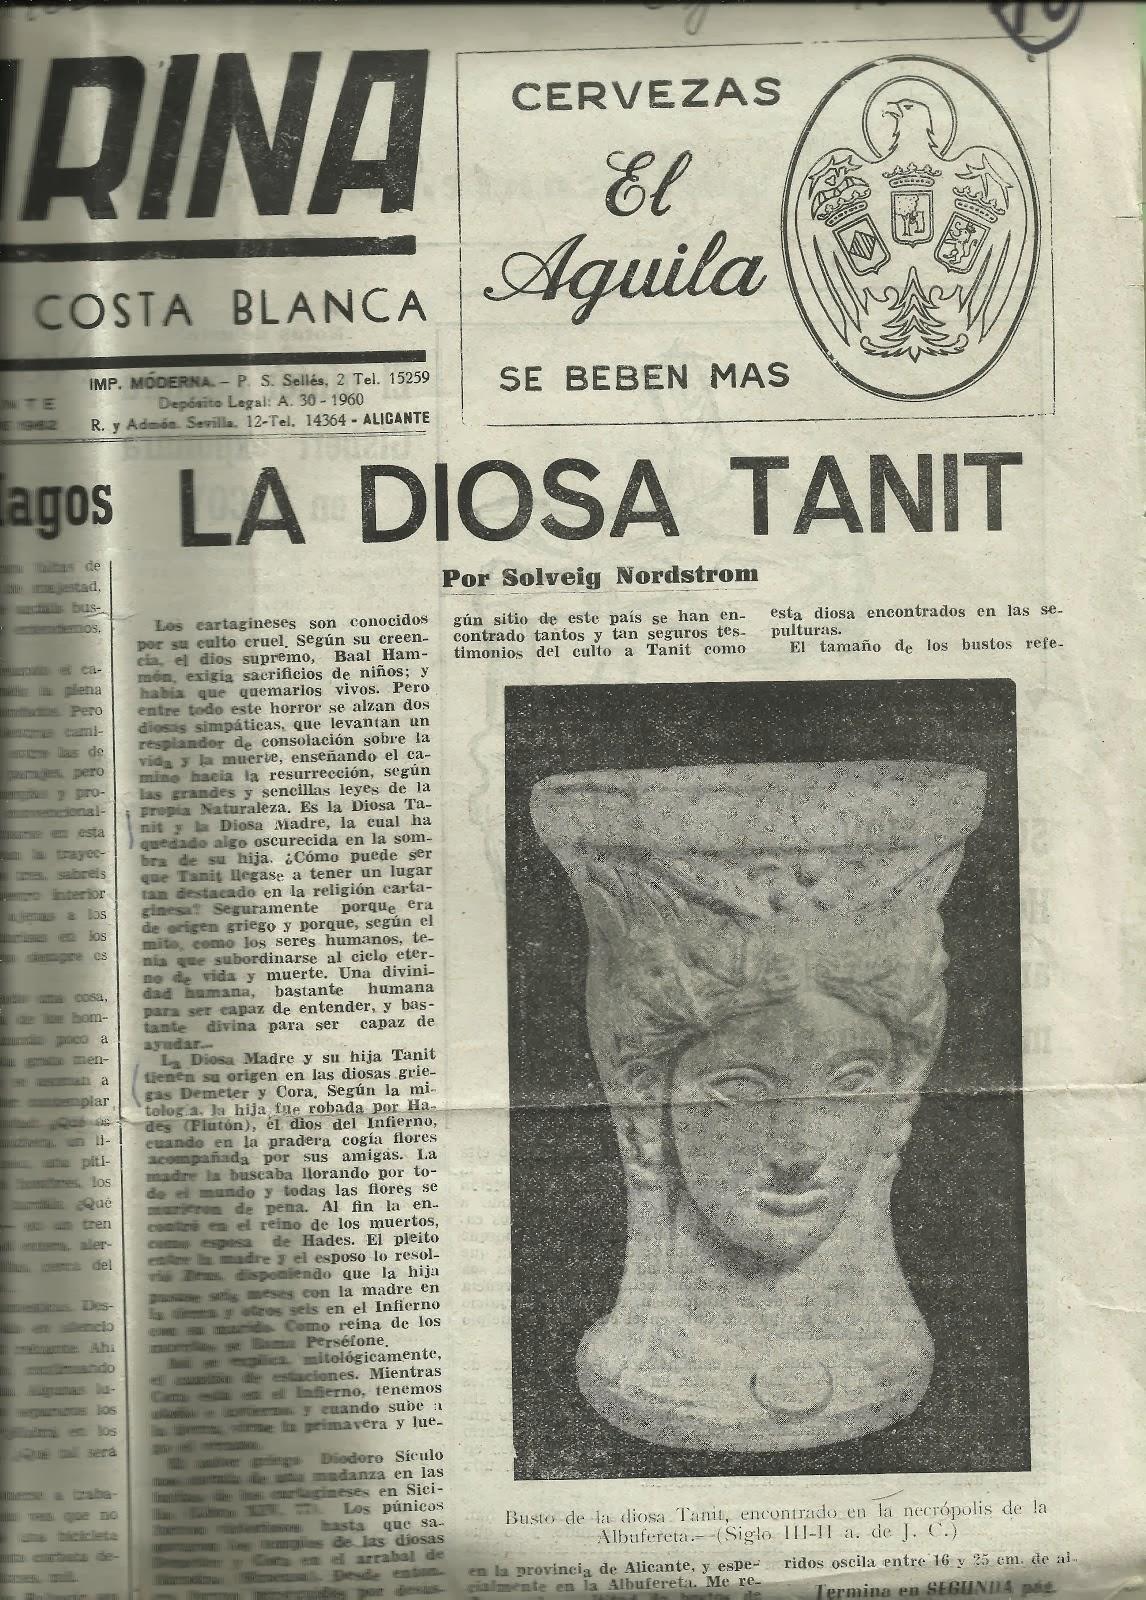 La diosa Tanit